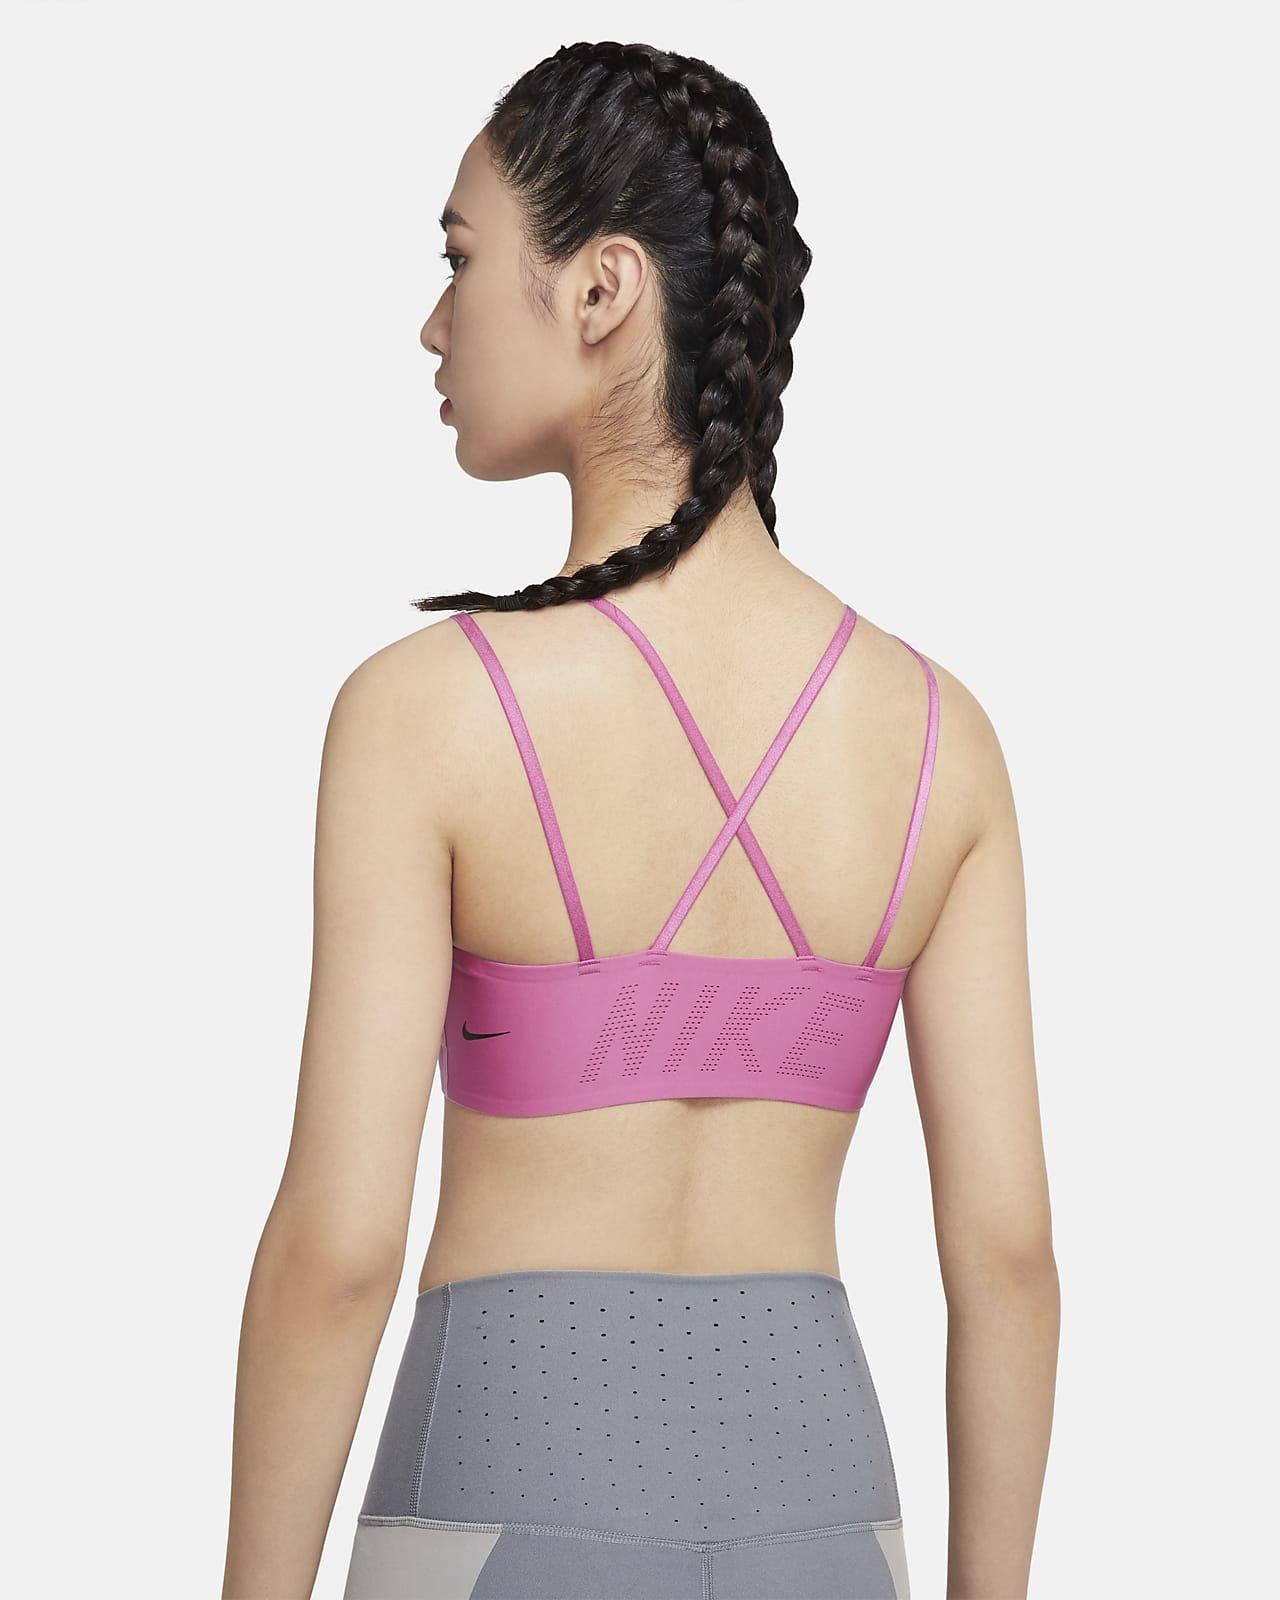 Nike Indy Breathe 女子低强度支撑运动内衣